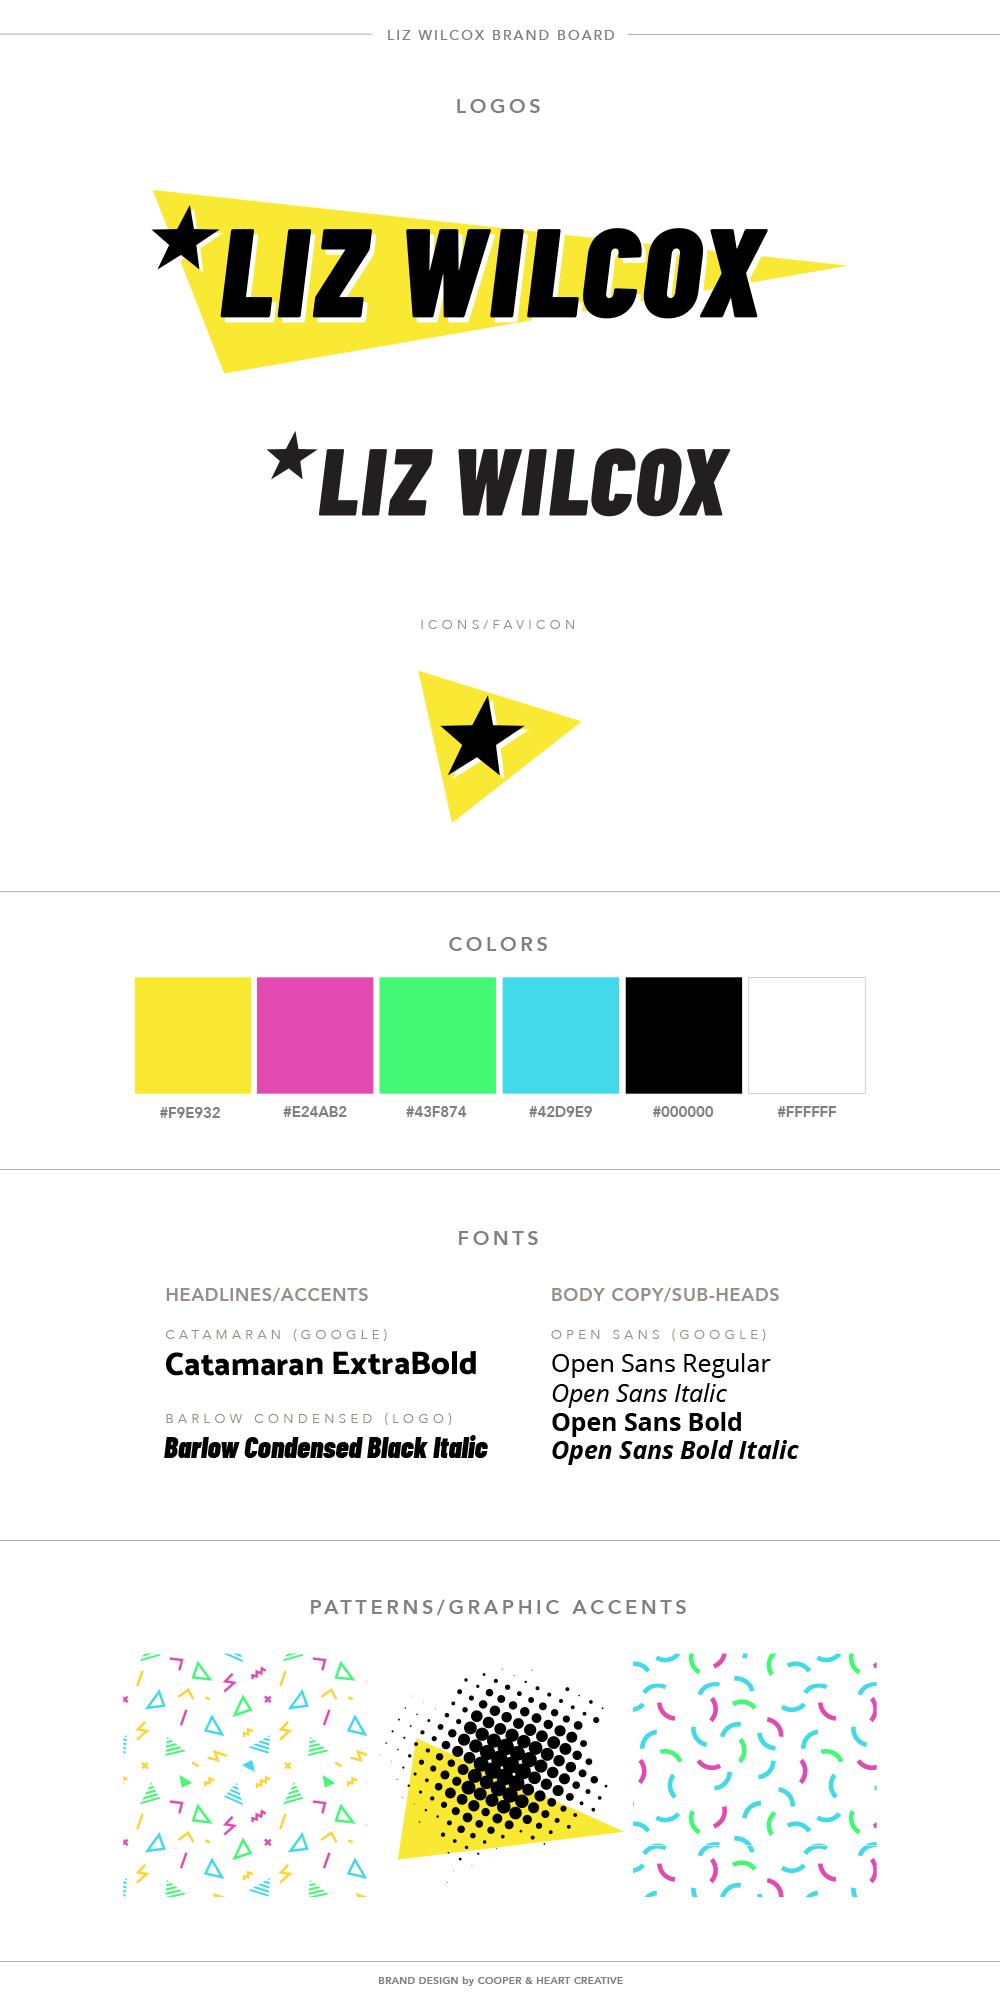 Liz Wilcox brand